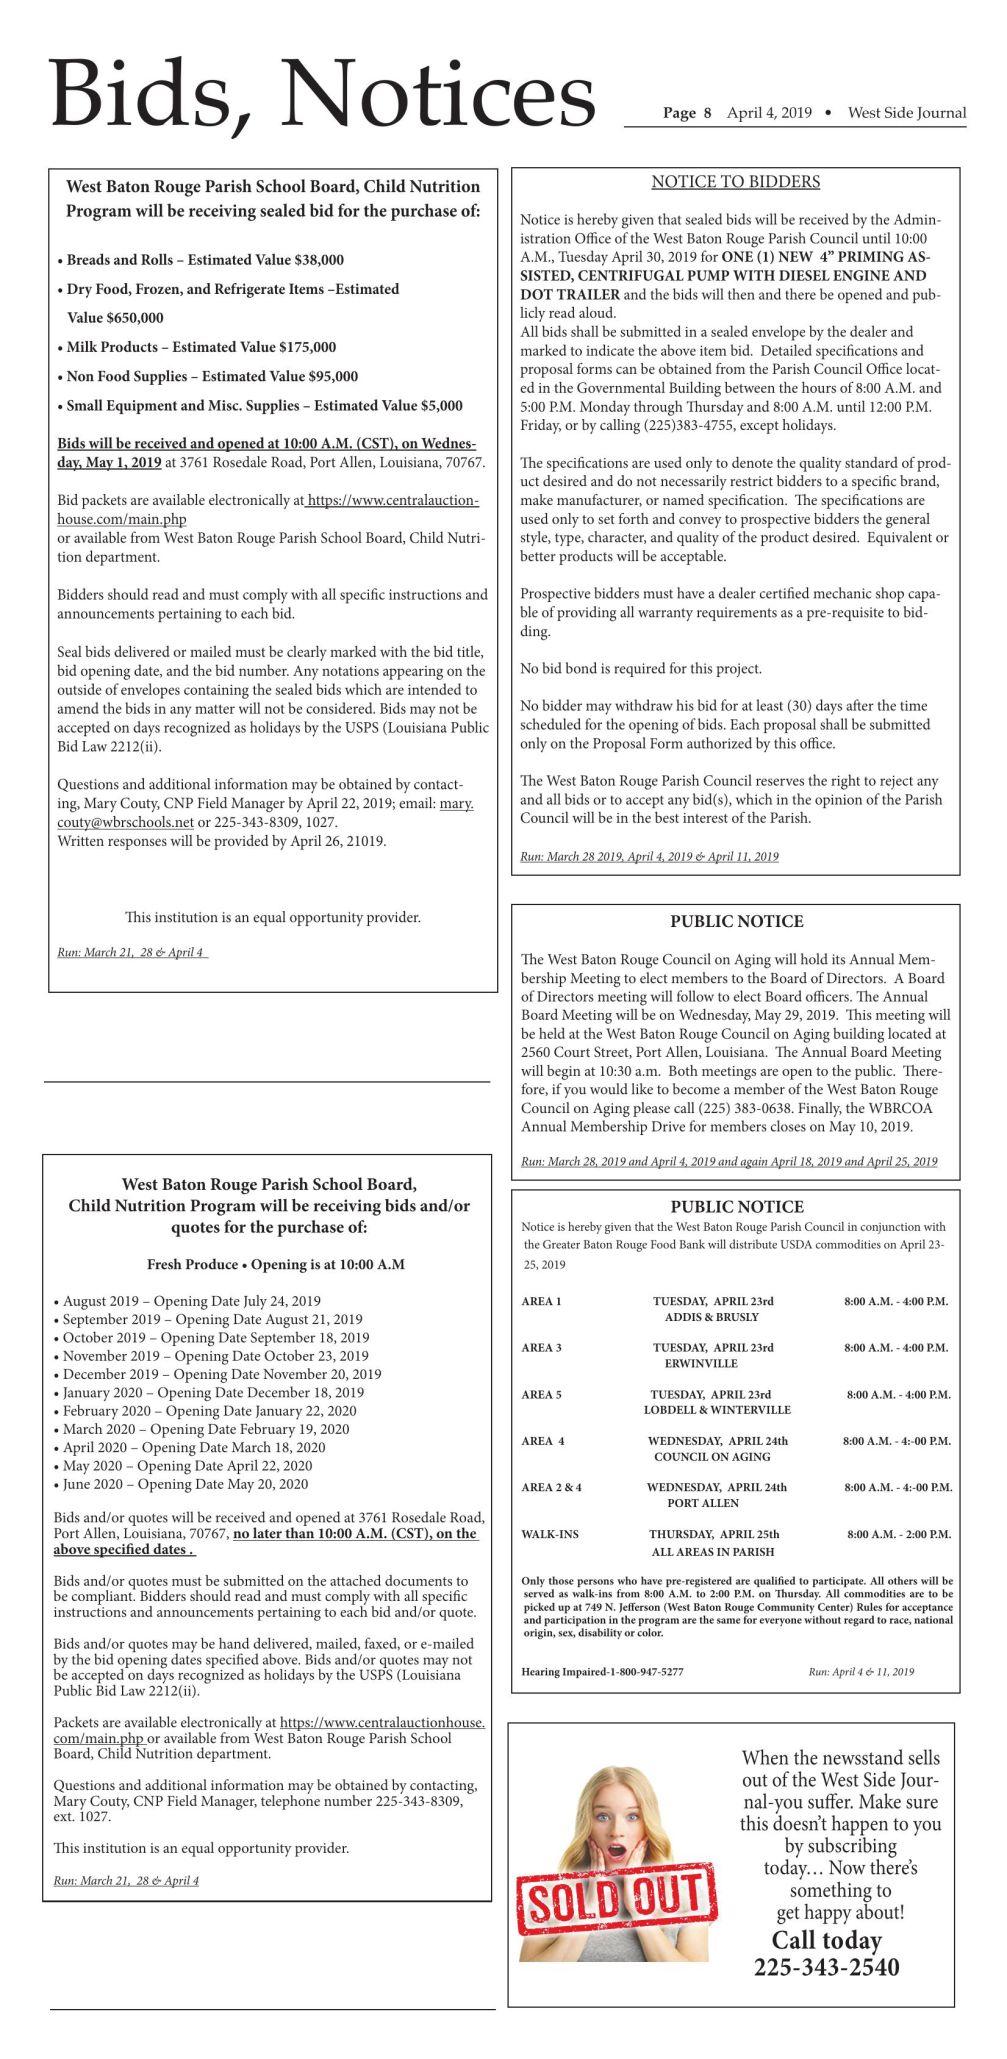 Bids & Notices 04.03.19